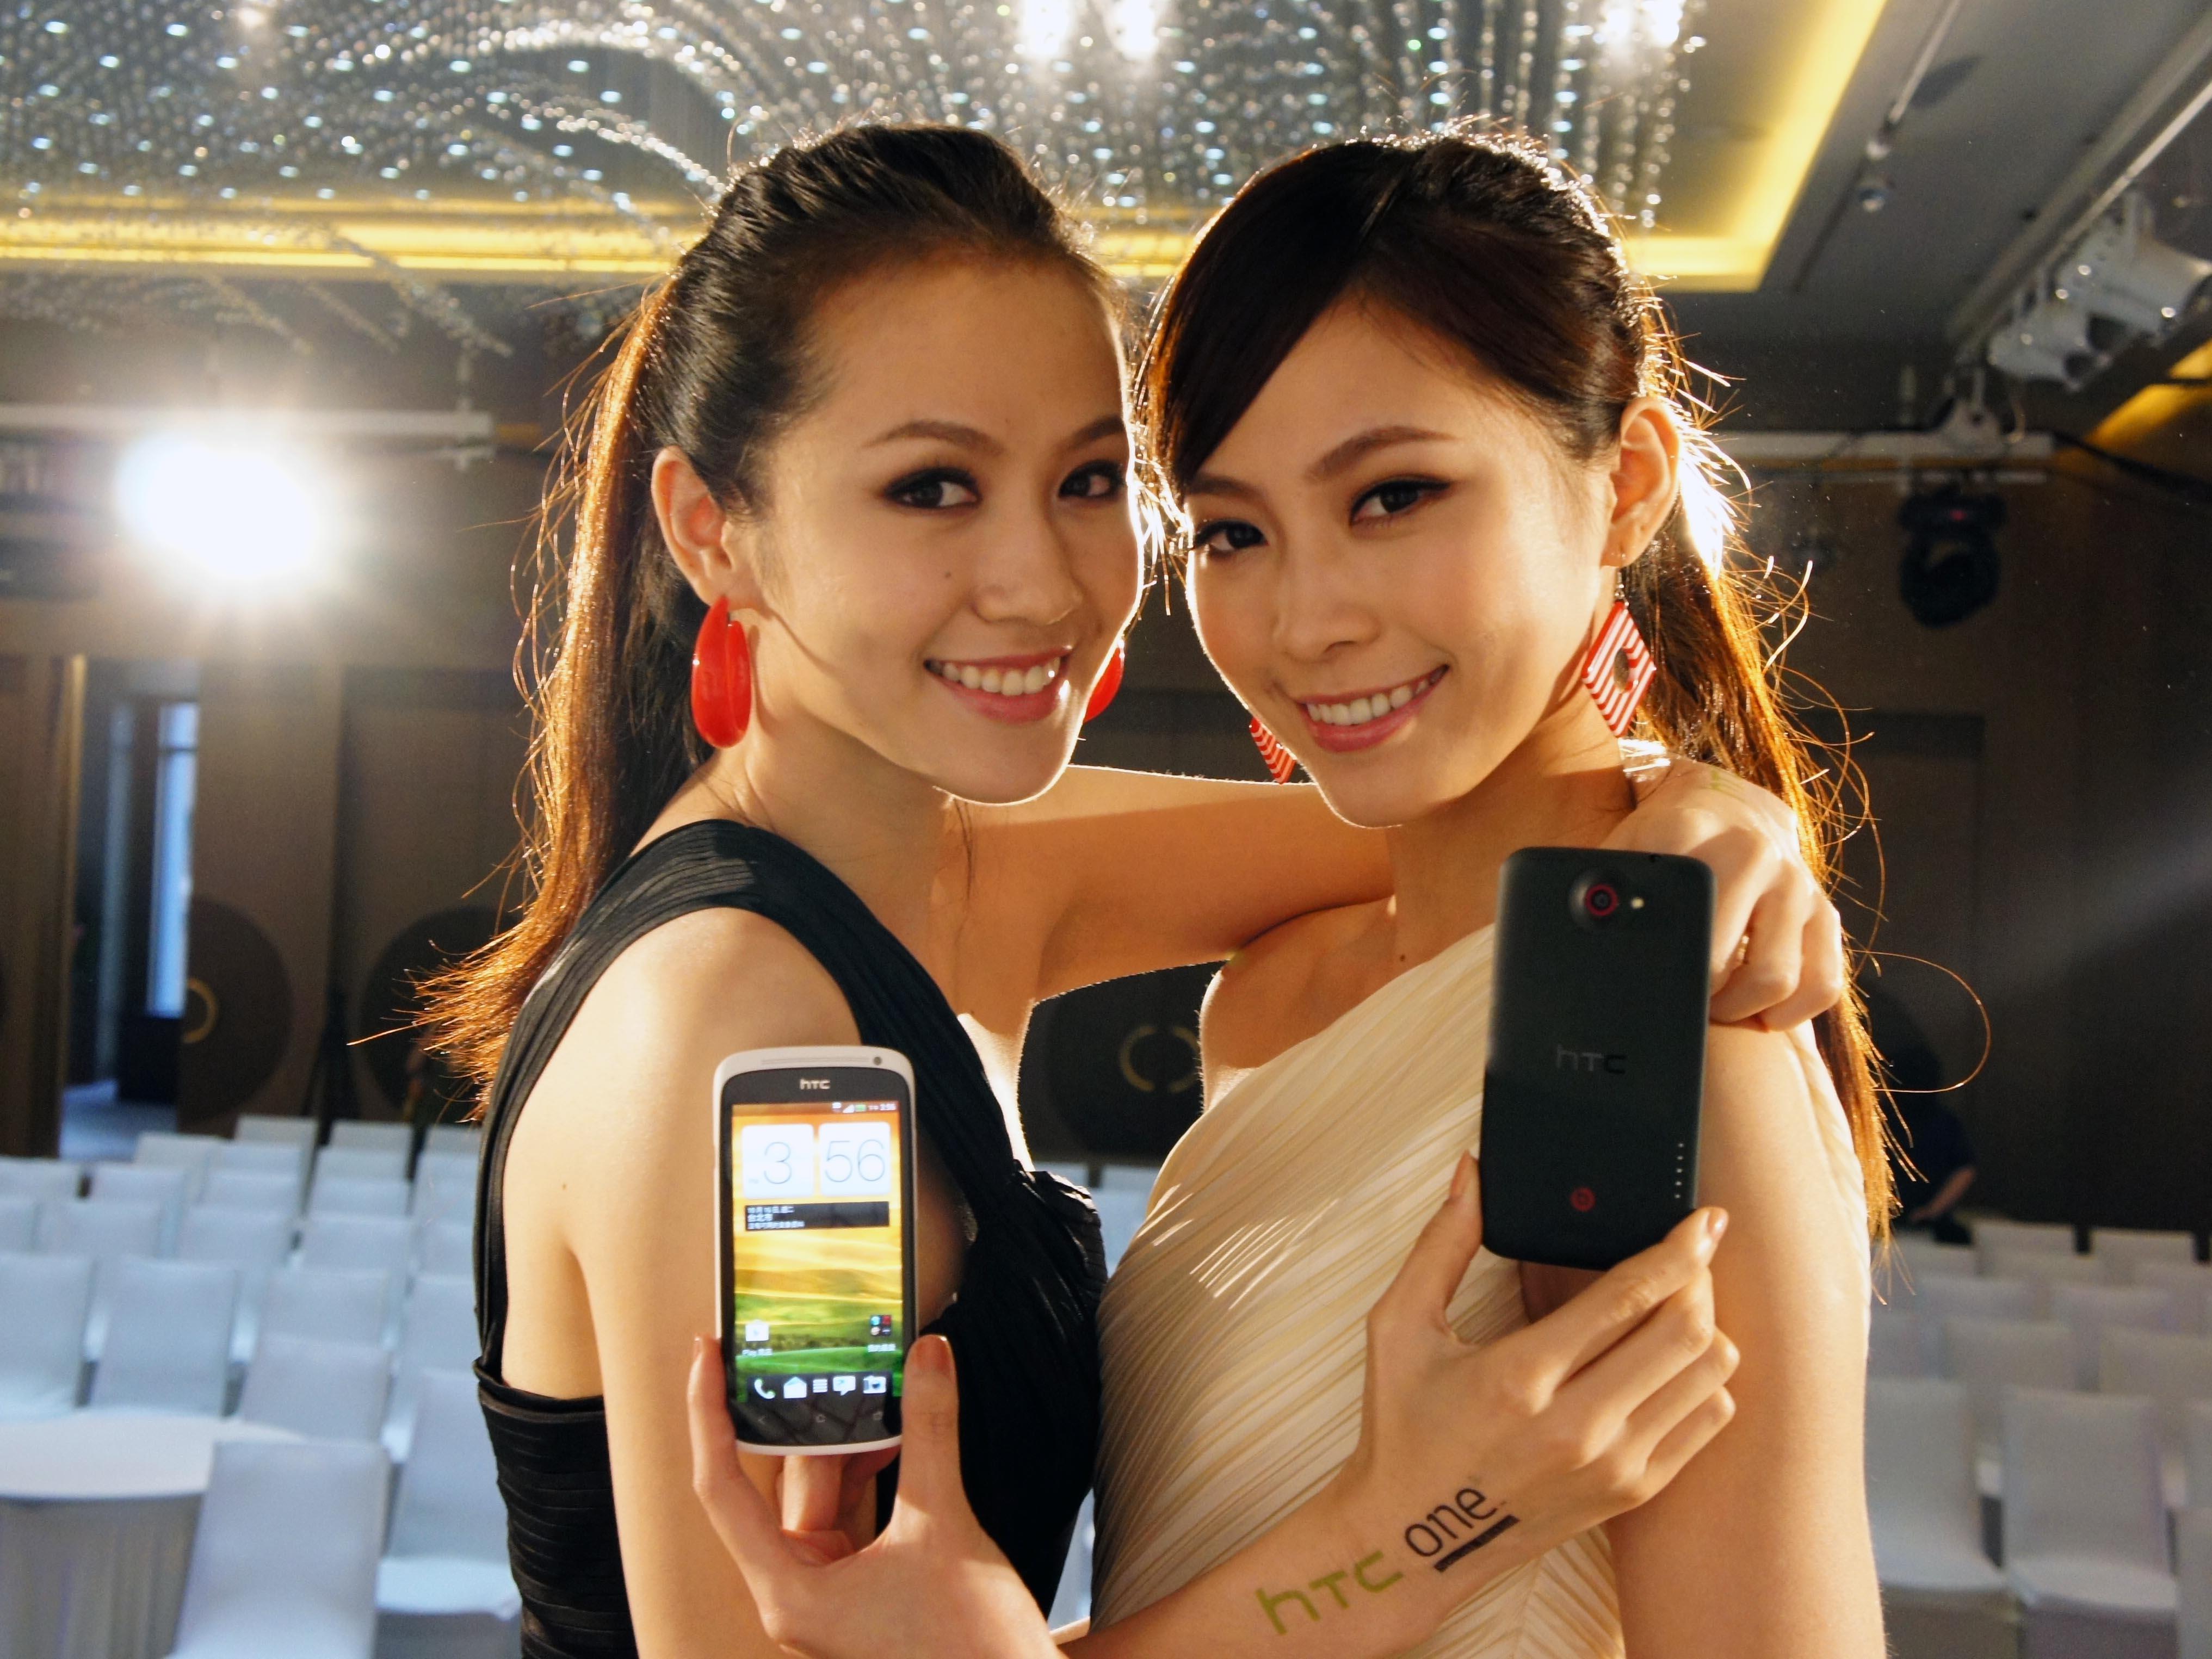 HTC One X+、One S 特別版發表,規格提升價格不變,現場動手玩